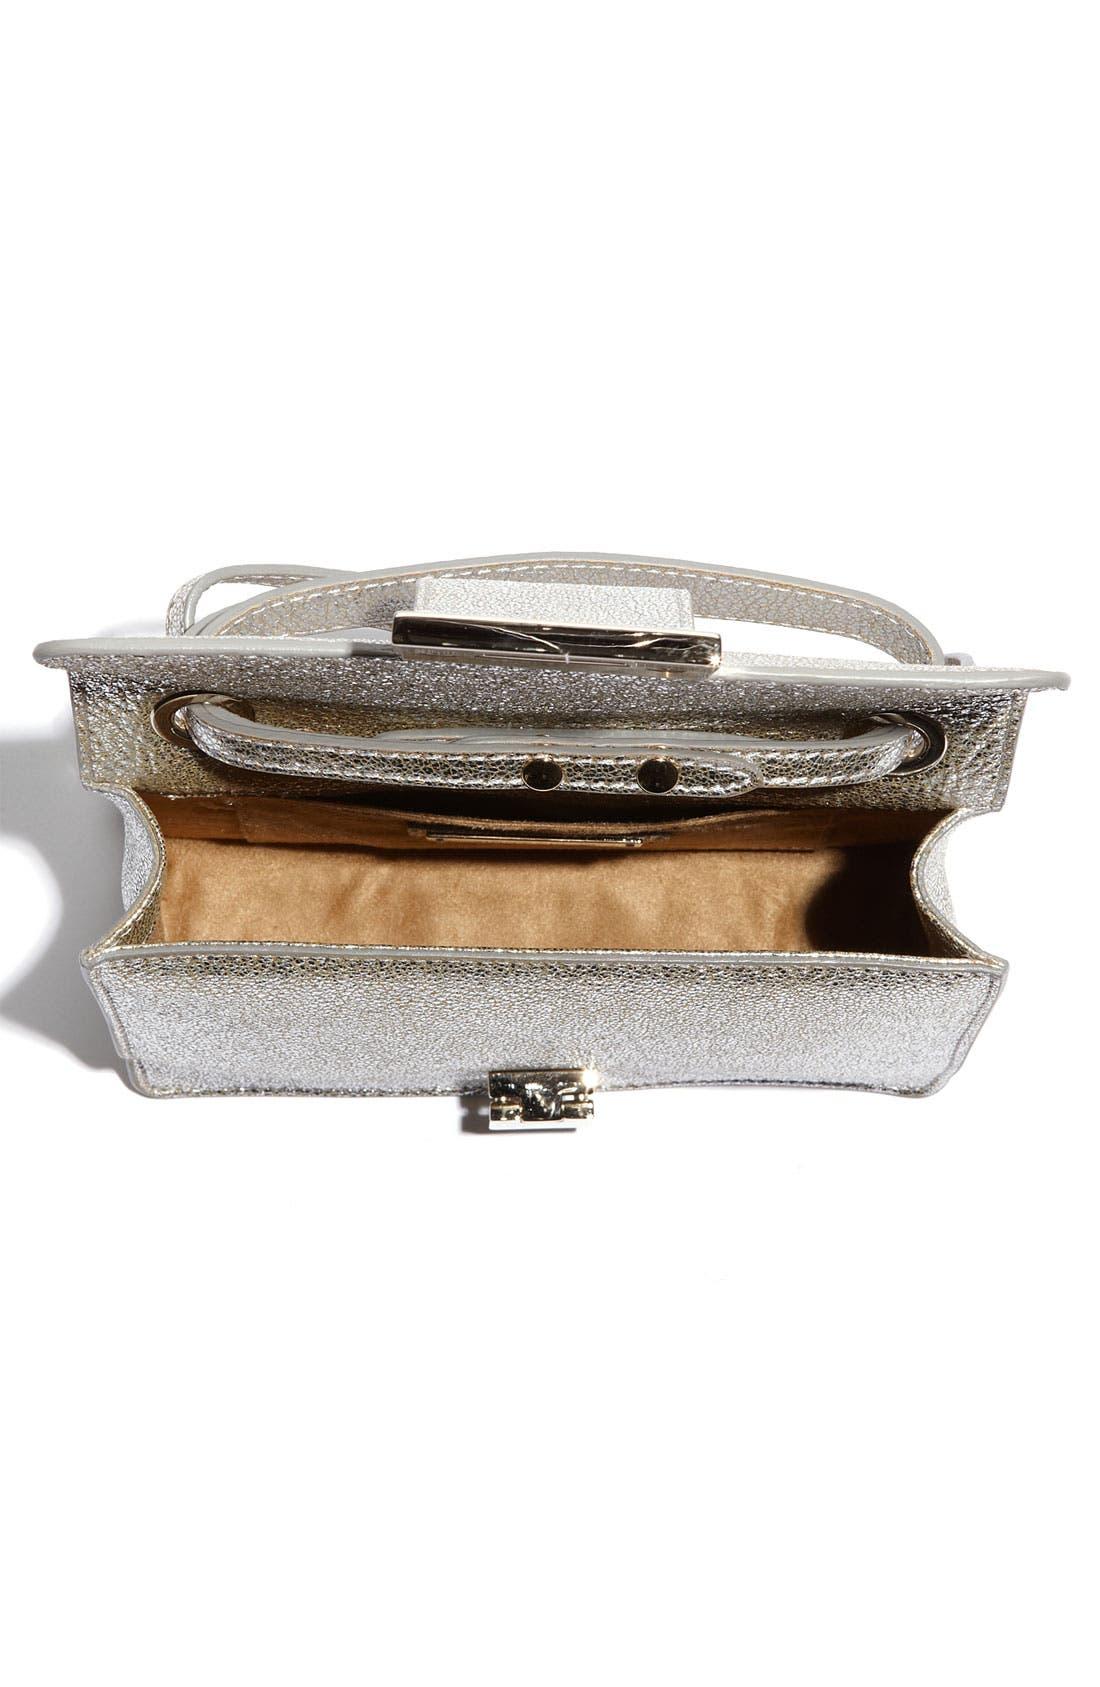 Alternate Image 3  - Jimmy Choo 'Rebel Mini' Glitter Leather Crossbody Bag